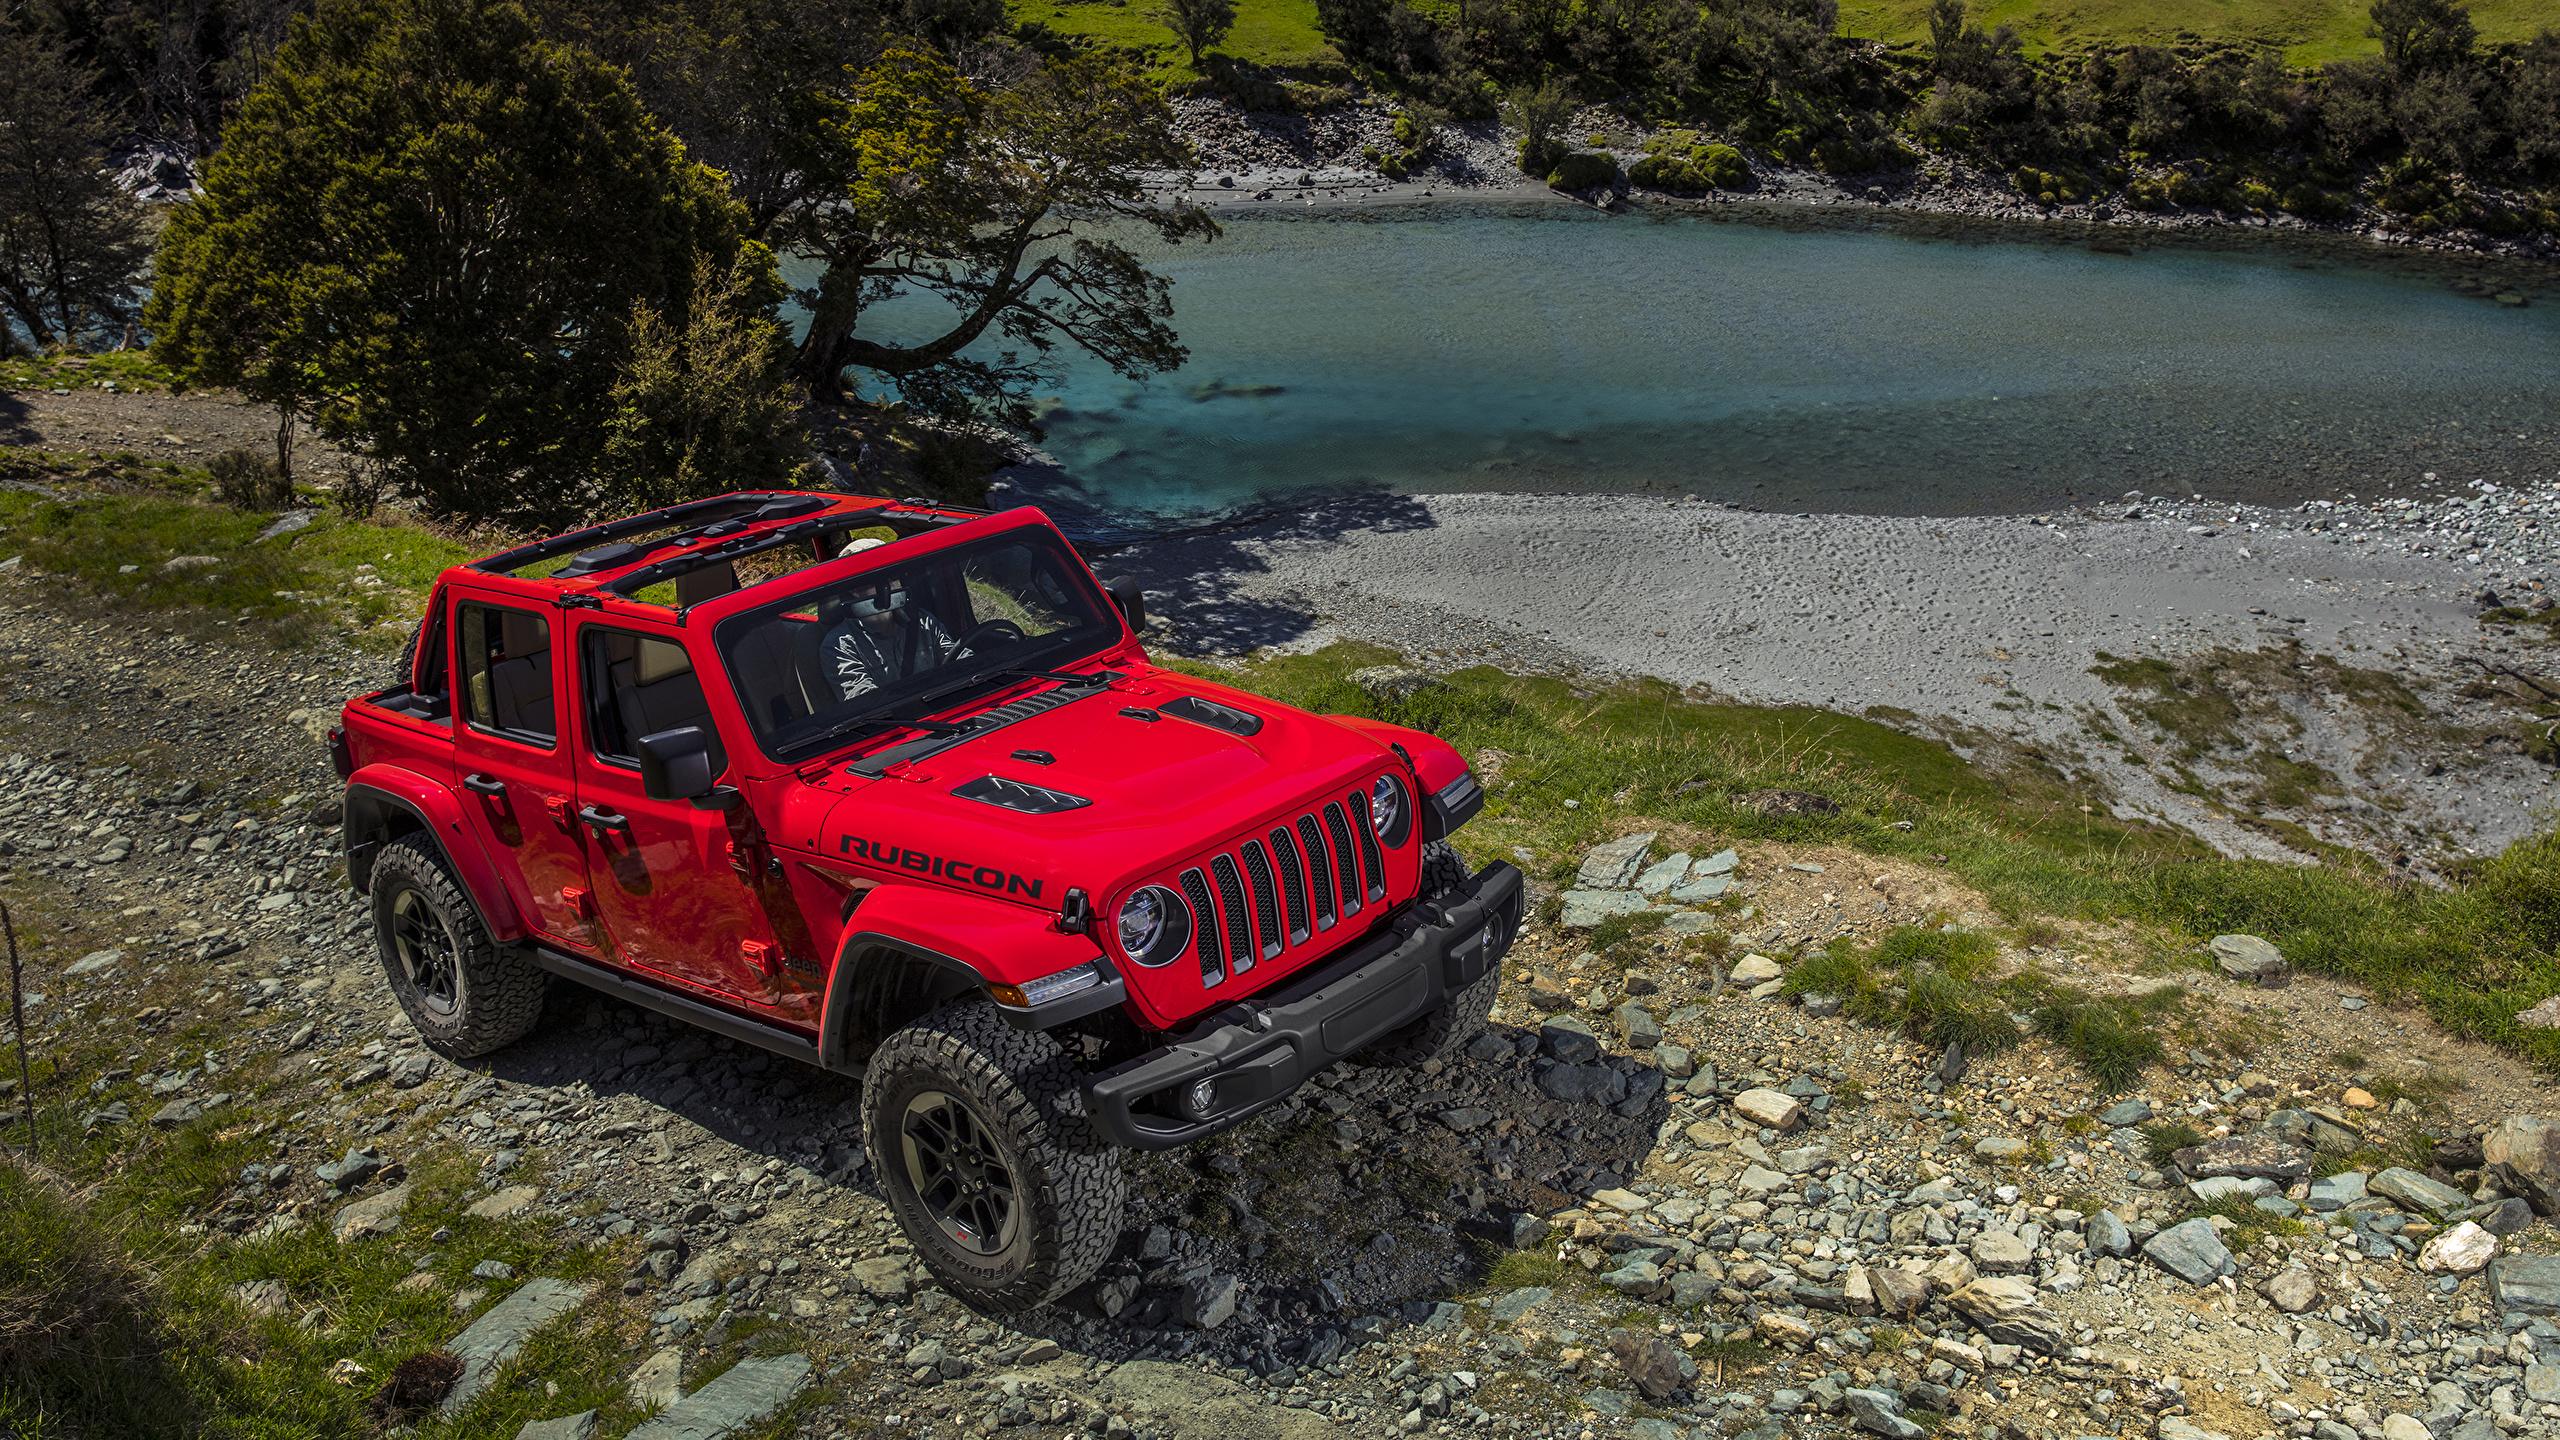 Smoky Mountain Adventure Rentals